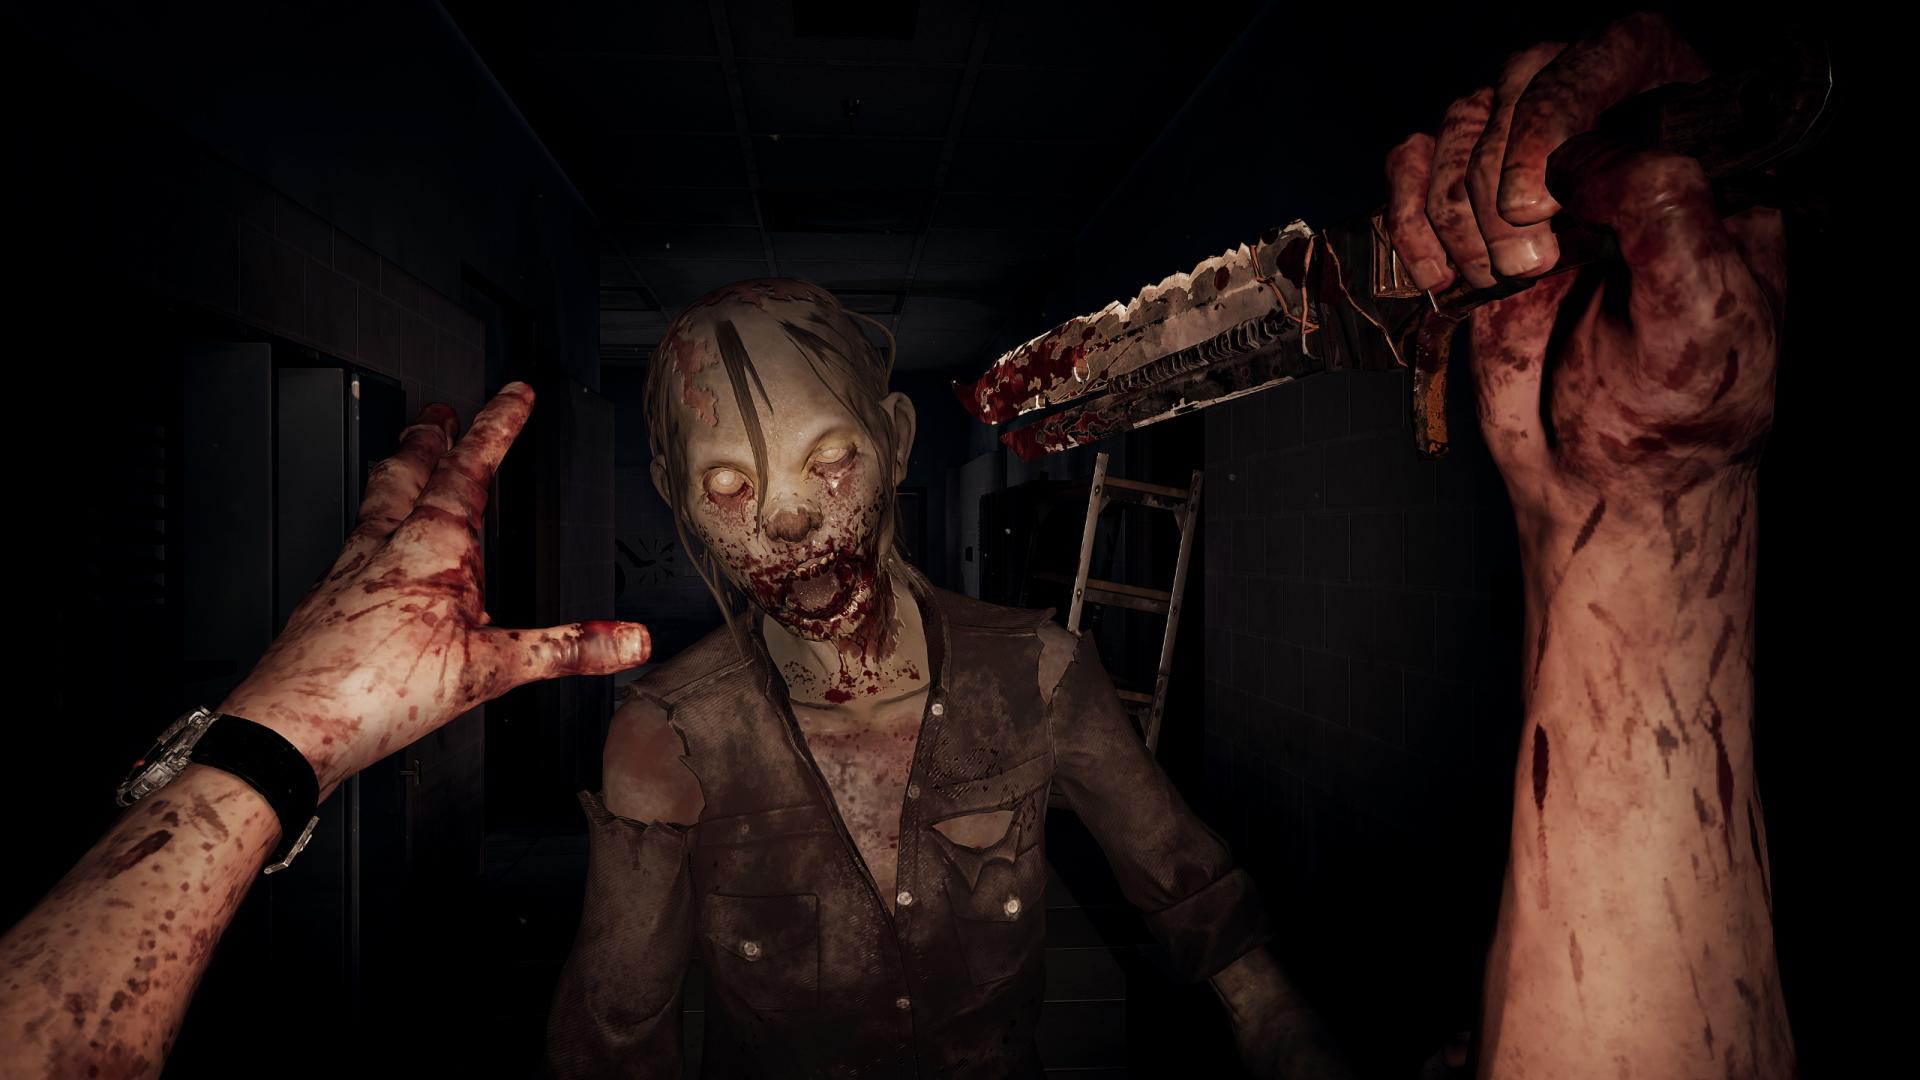 Oculus Quest 2 review: The Walking Dead: Saints & Sinners